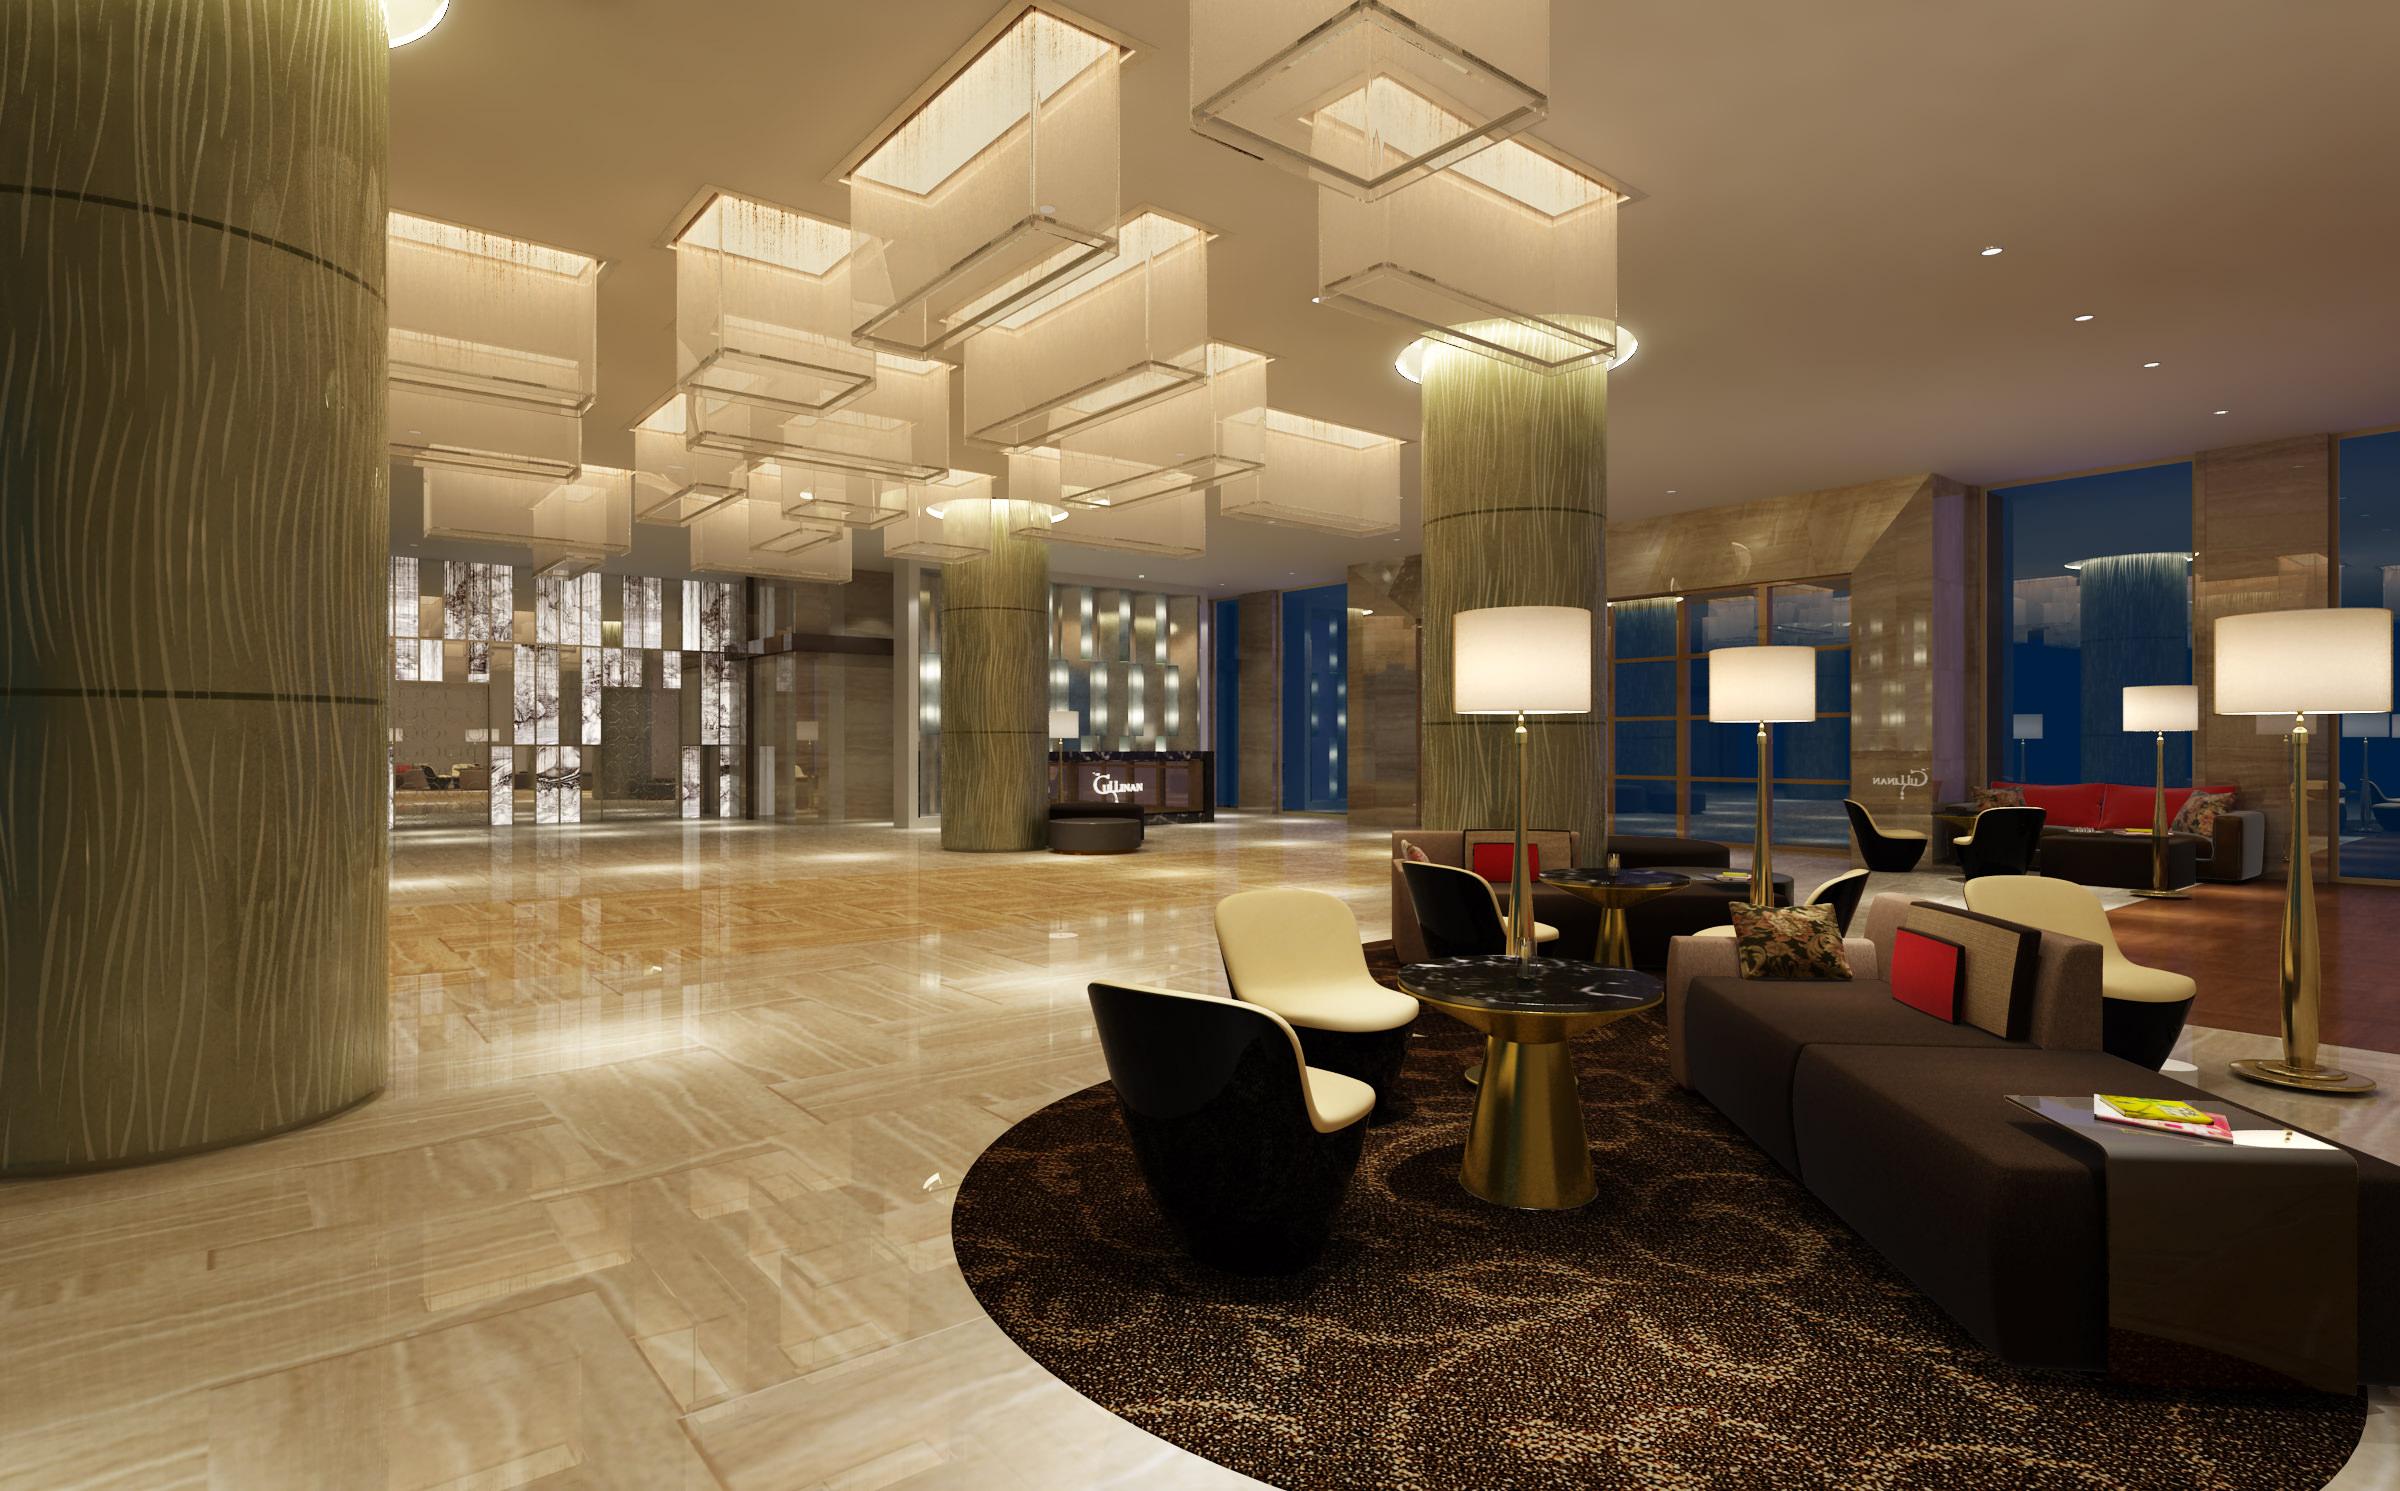 Modern Hotel Lobby 3d Model Max 1